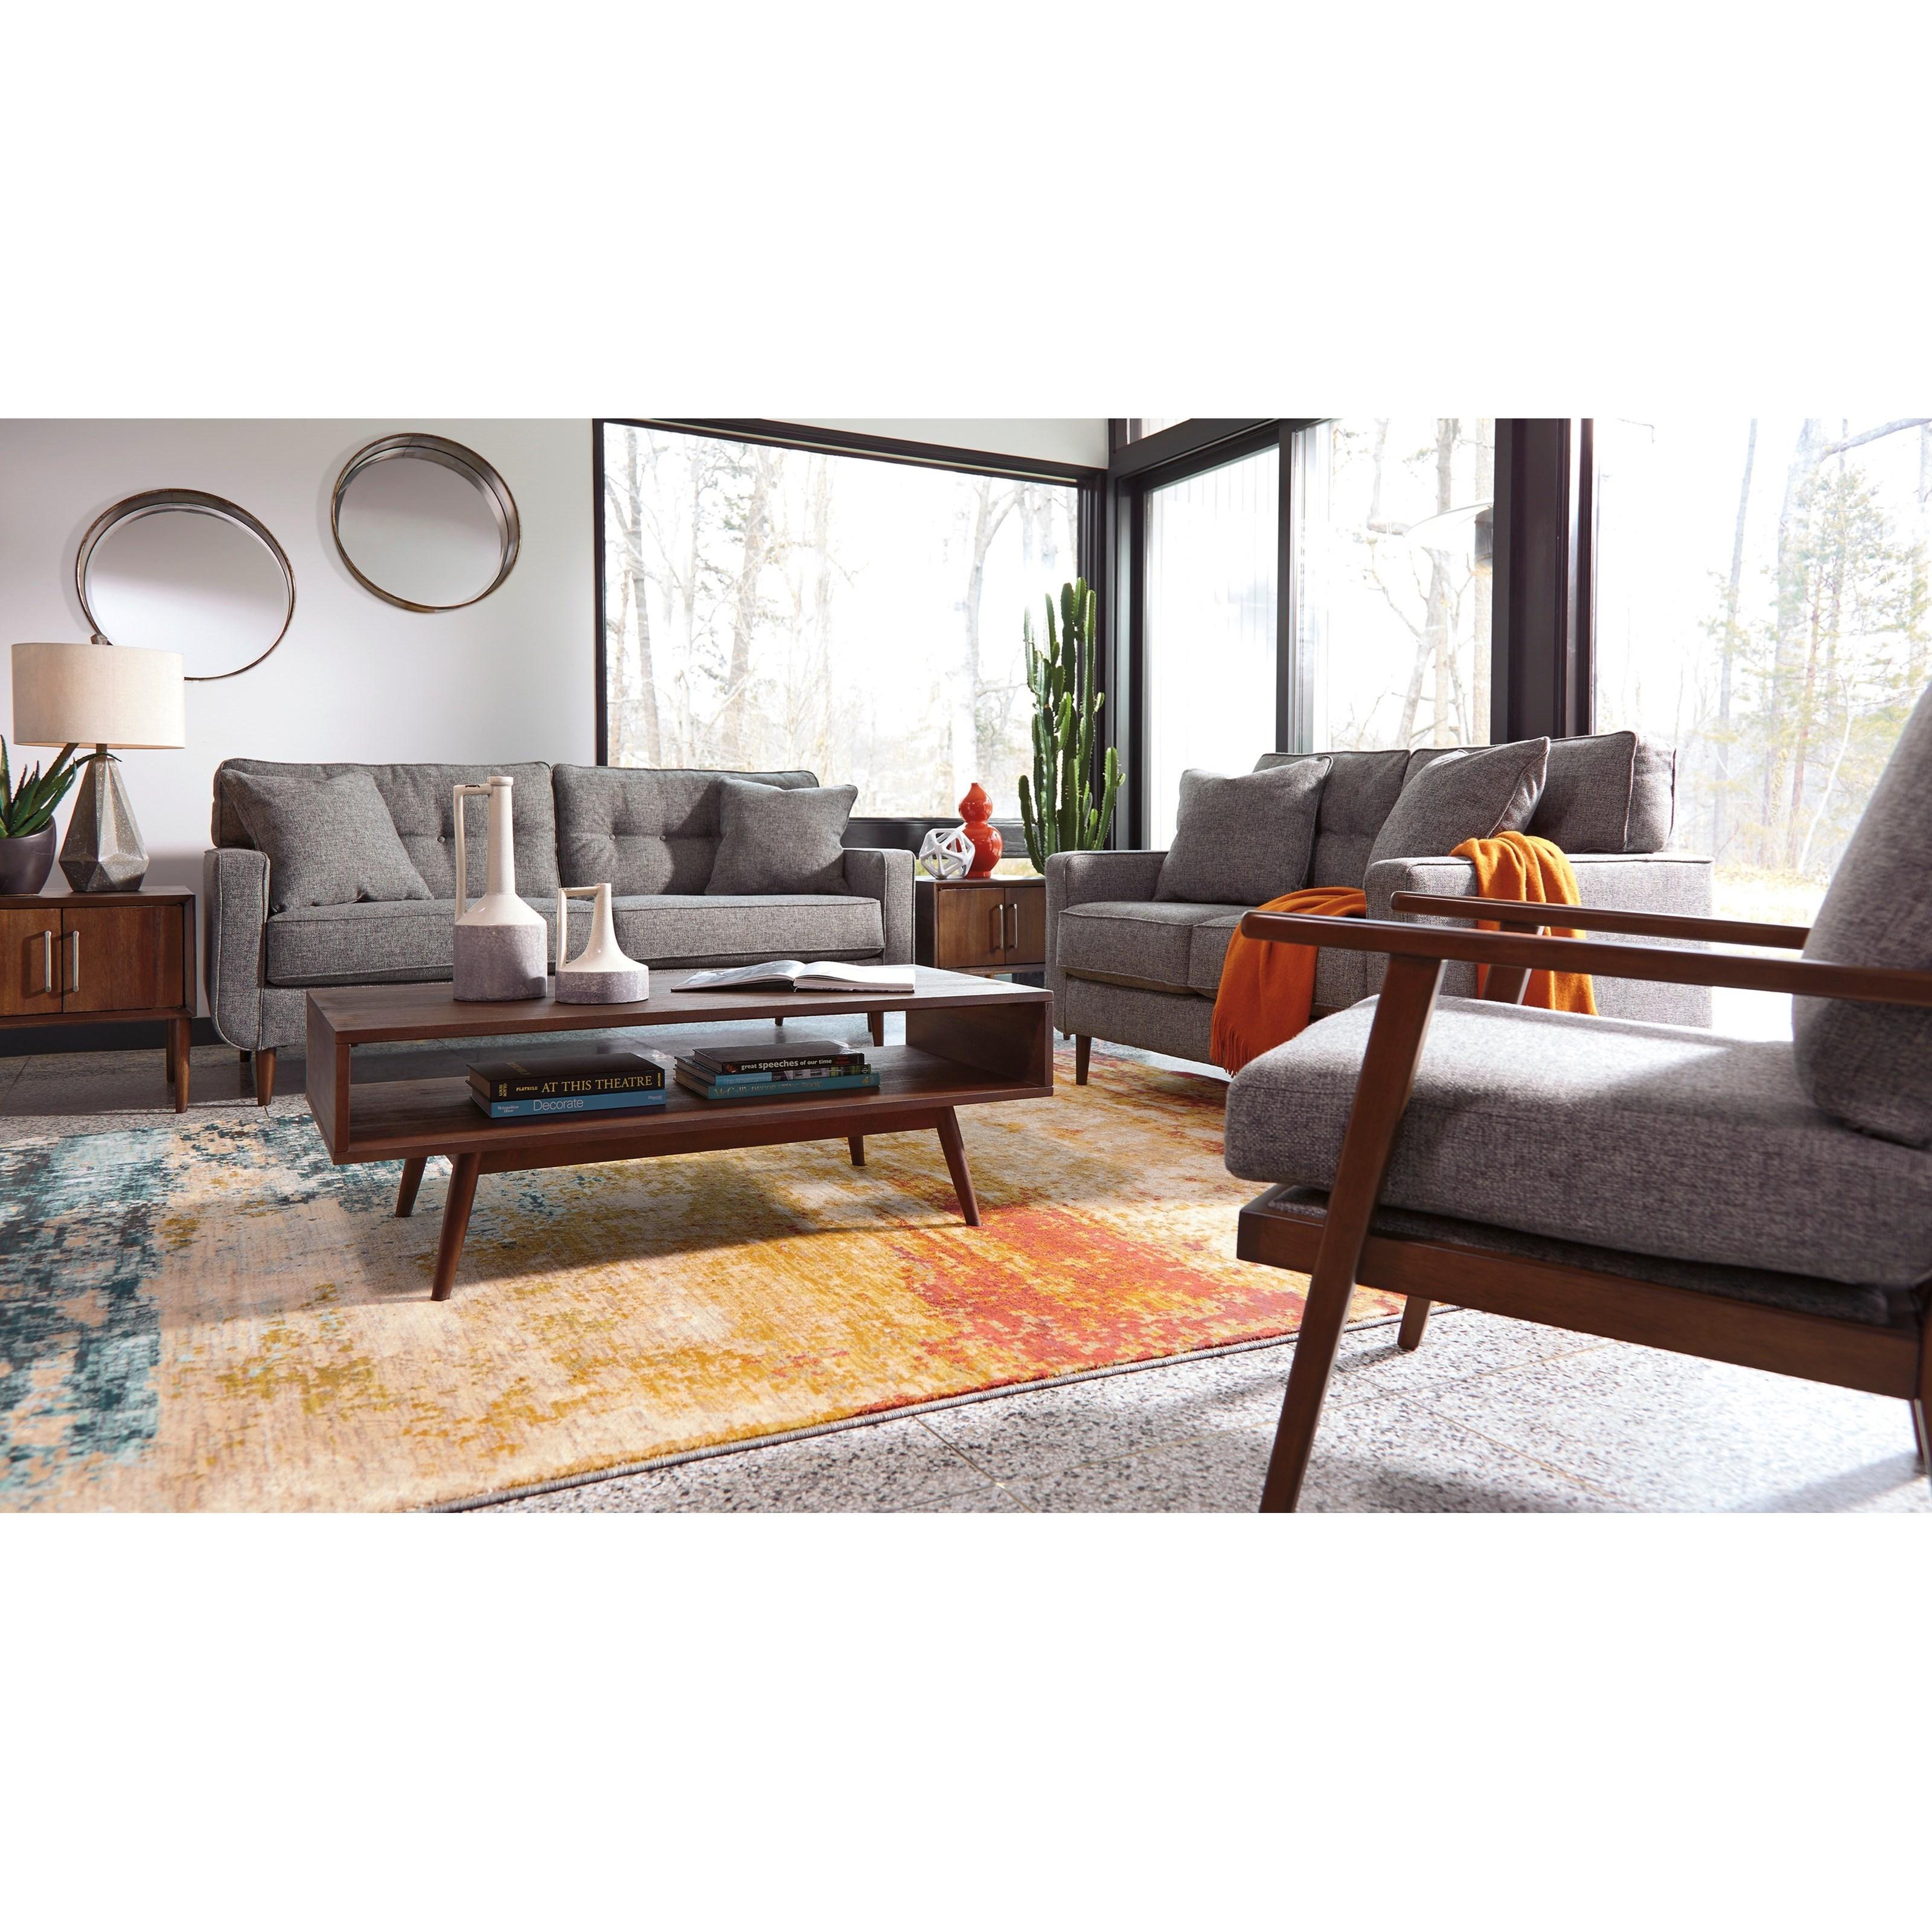 ashley furniture modern sofa set in johor bahru zardoni mid century olinde